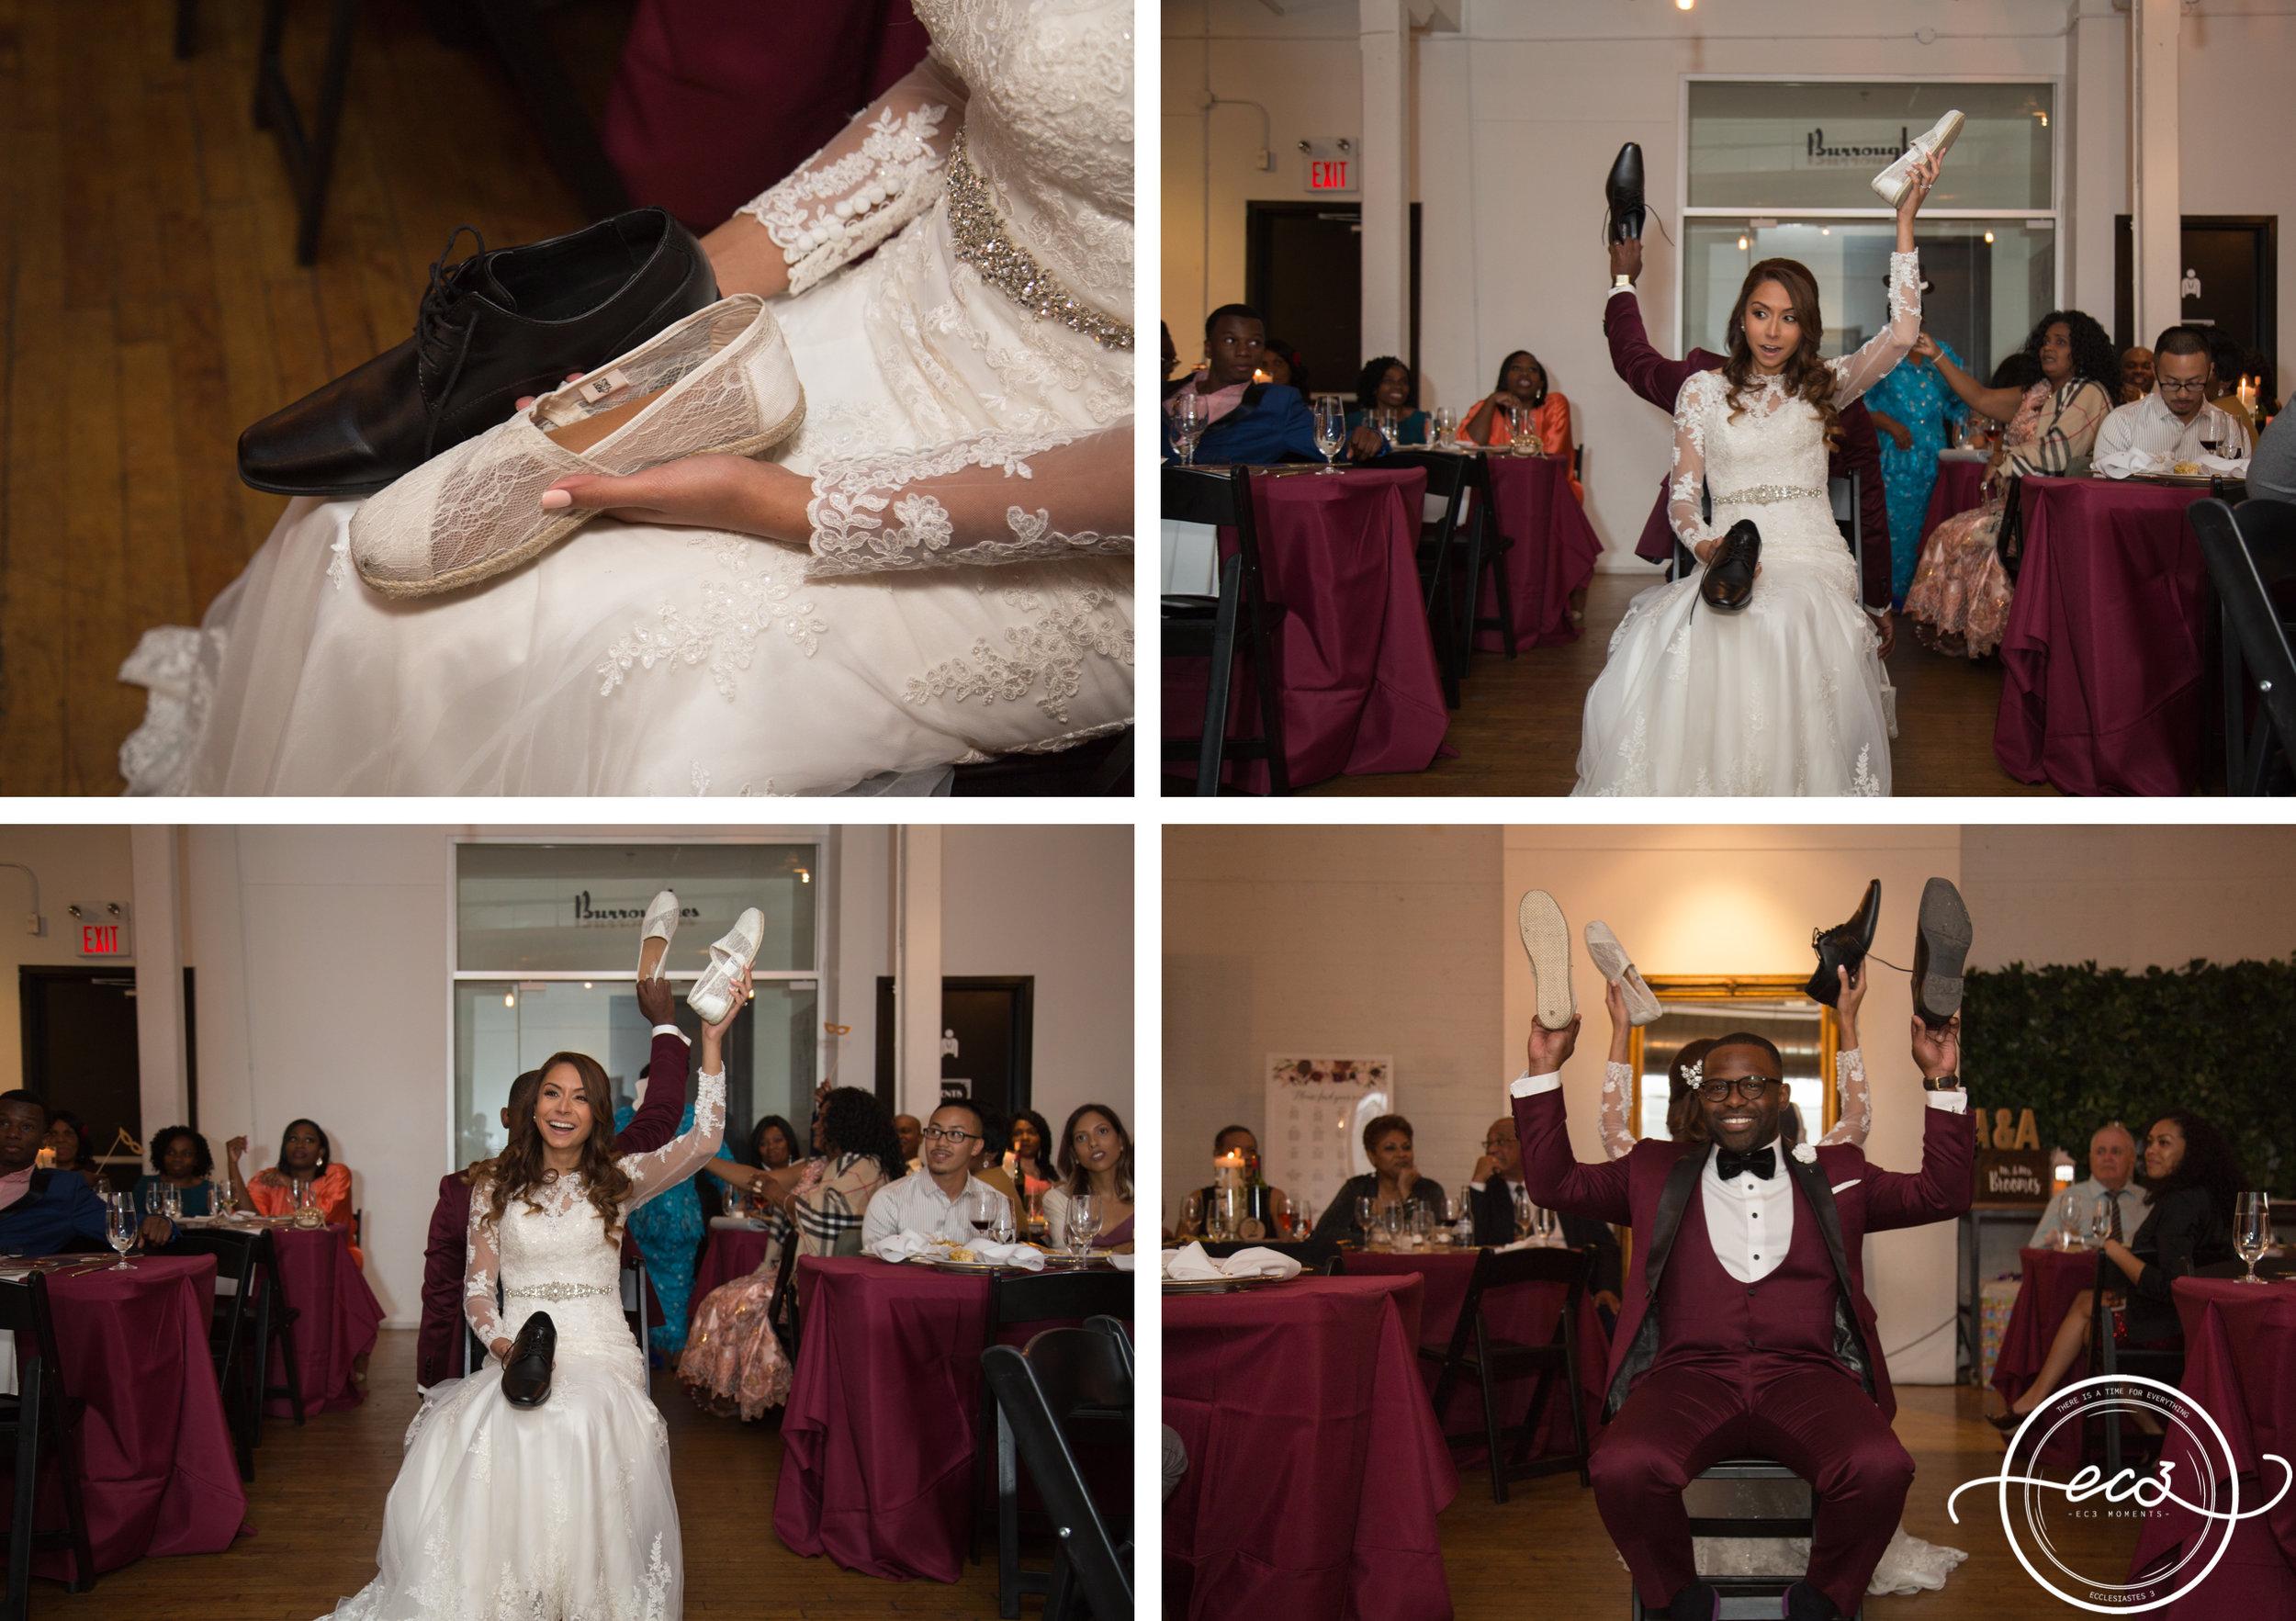 AA-Rustic-Toronto-Burroughes-Wedding49.jpg